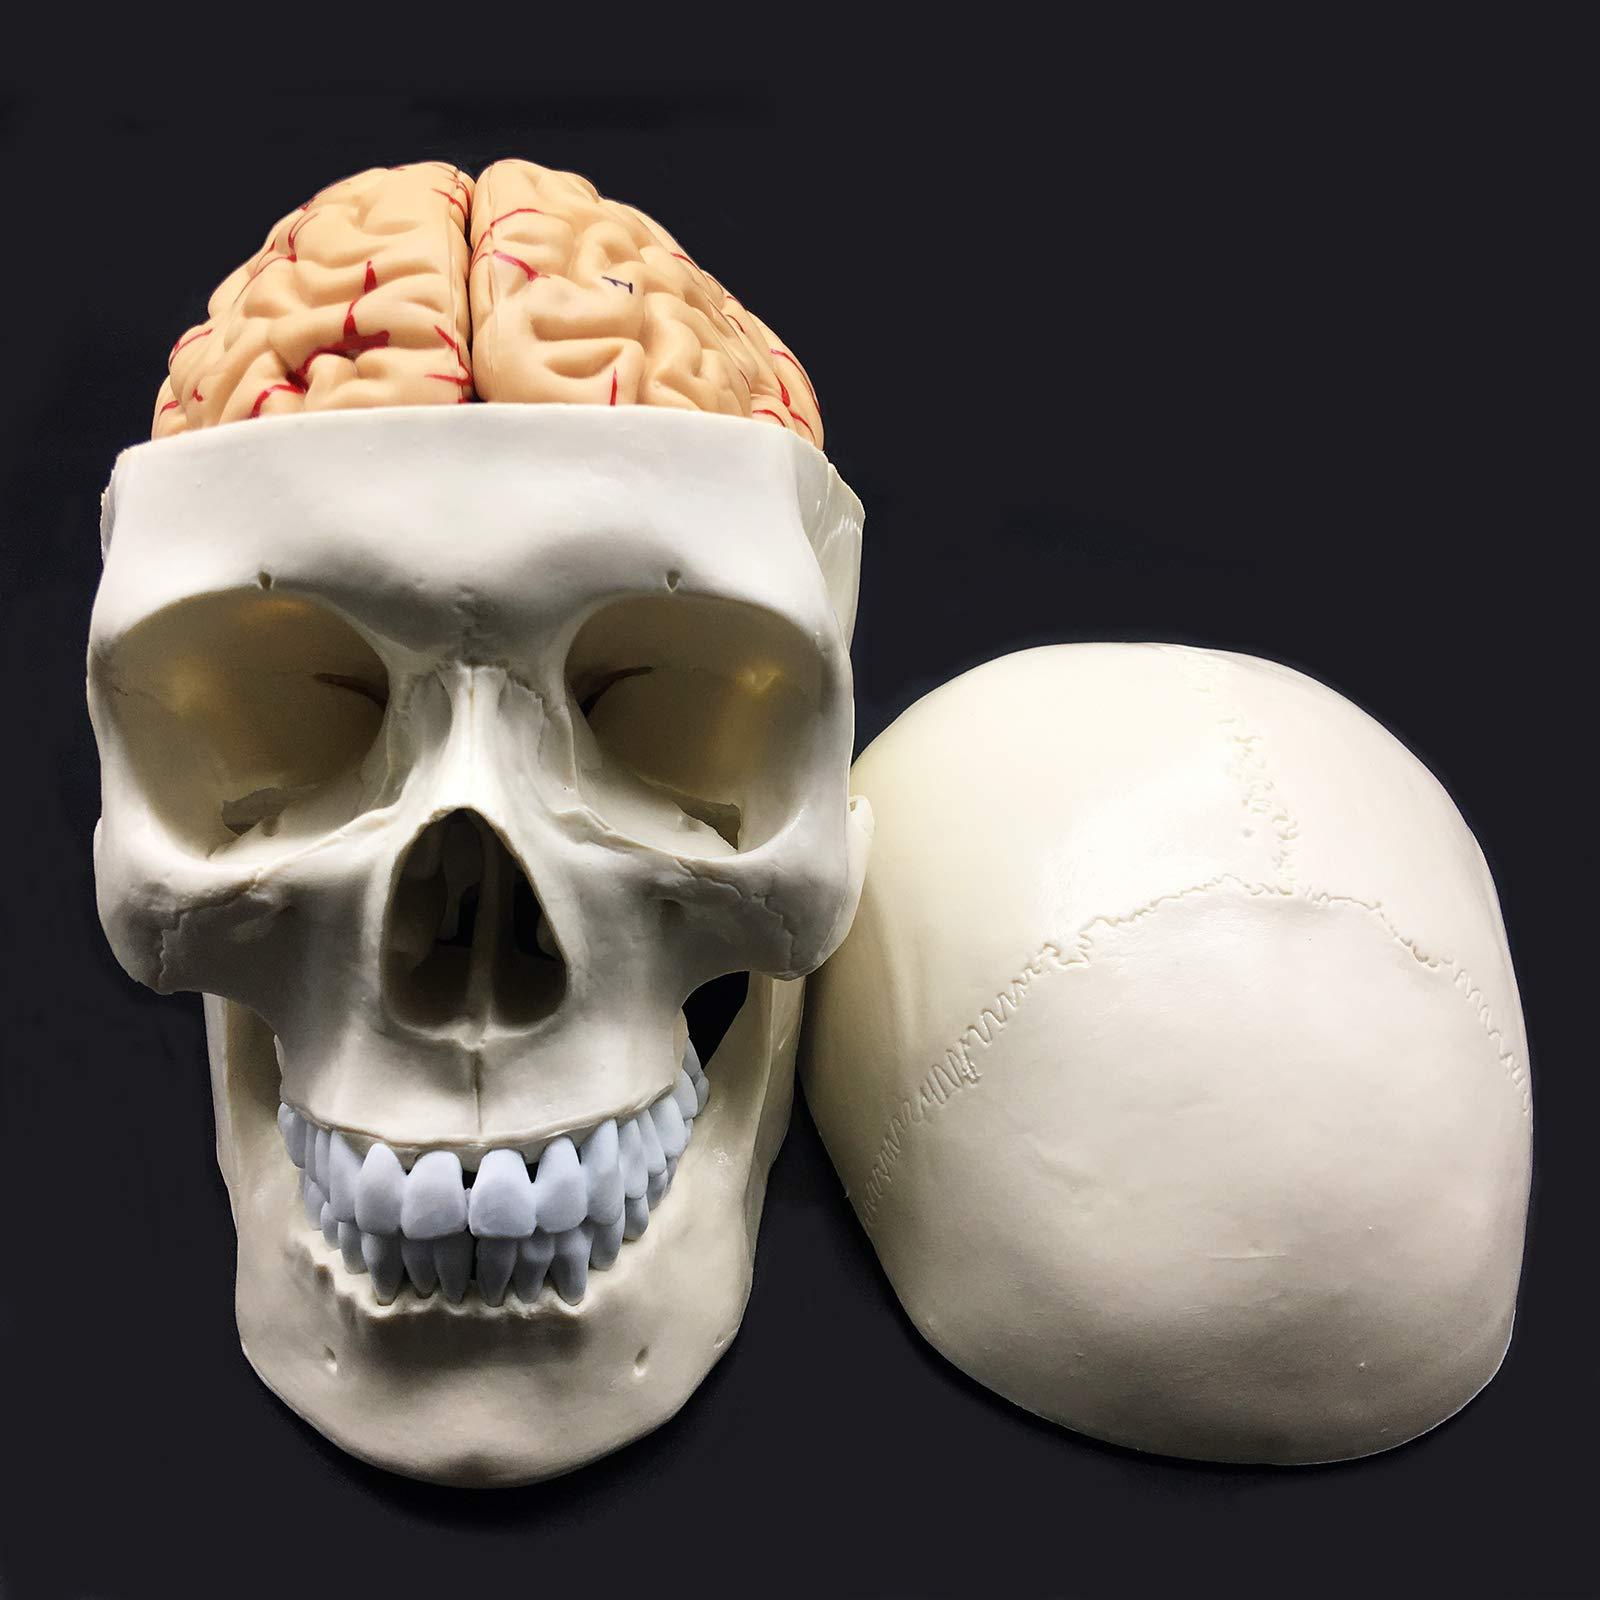 Anatomical Life Size Anatomy Classroom Teaching